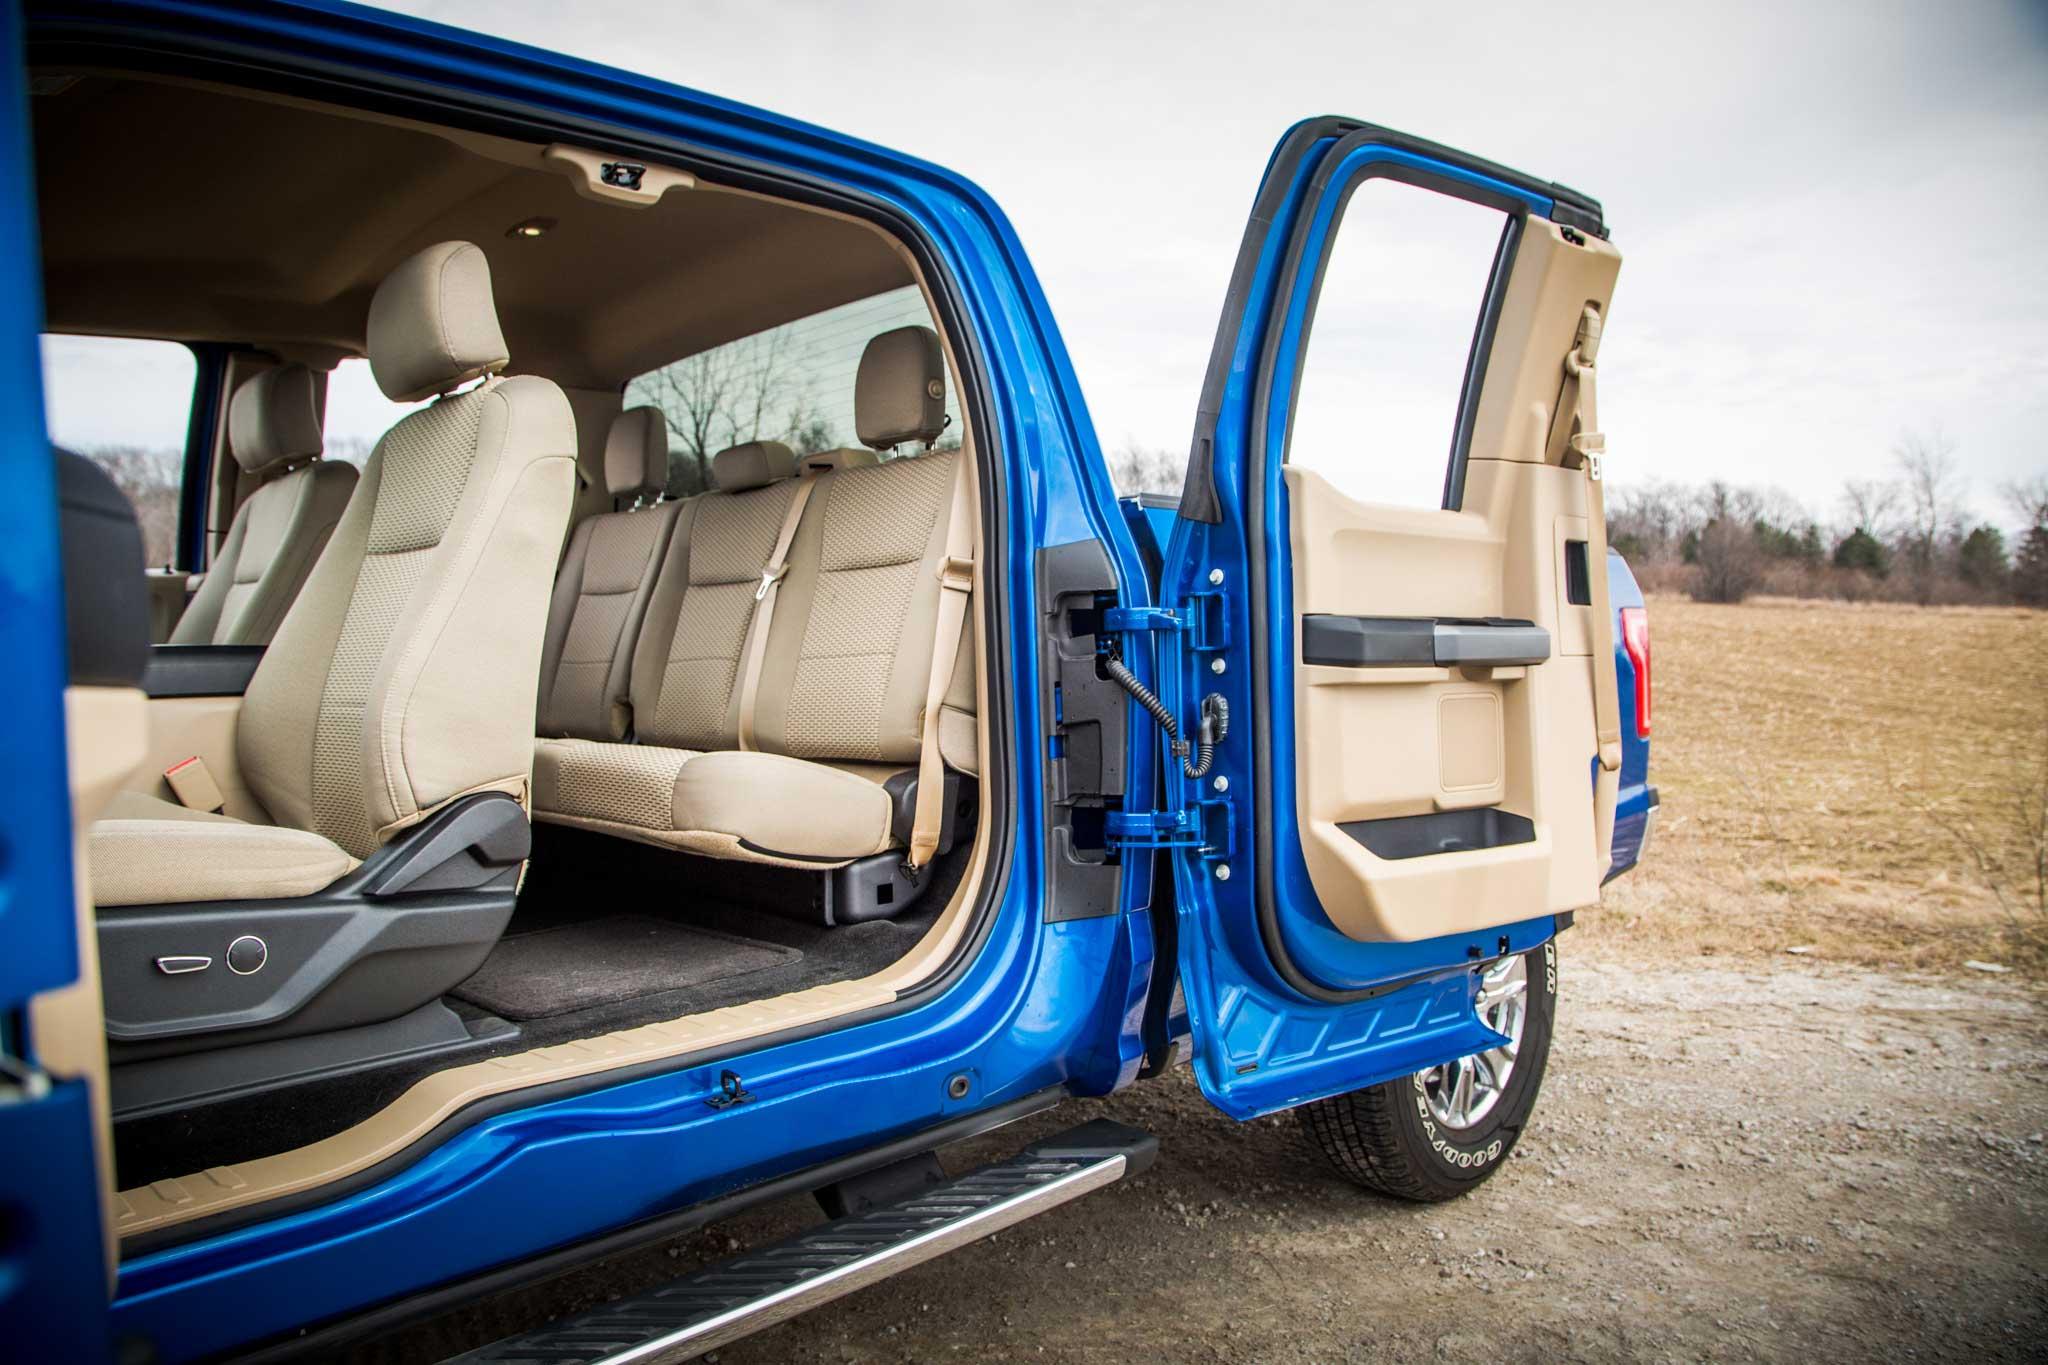 2015-ford-f-150-suicide-door & 2015-ford-f-150-suicide-door - Lowrider pezcame.com